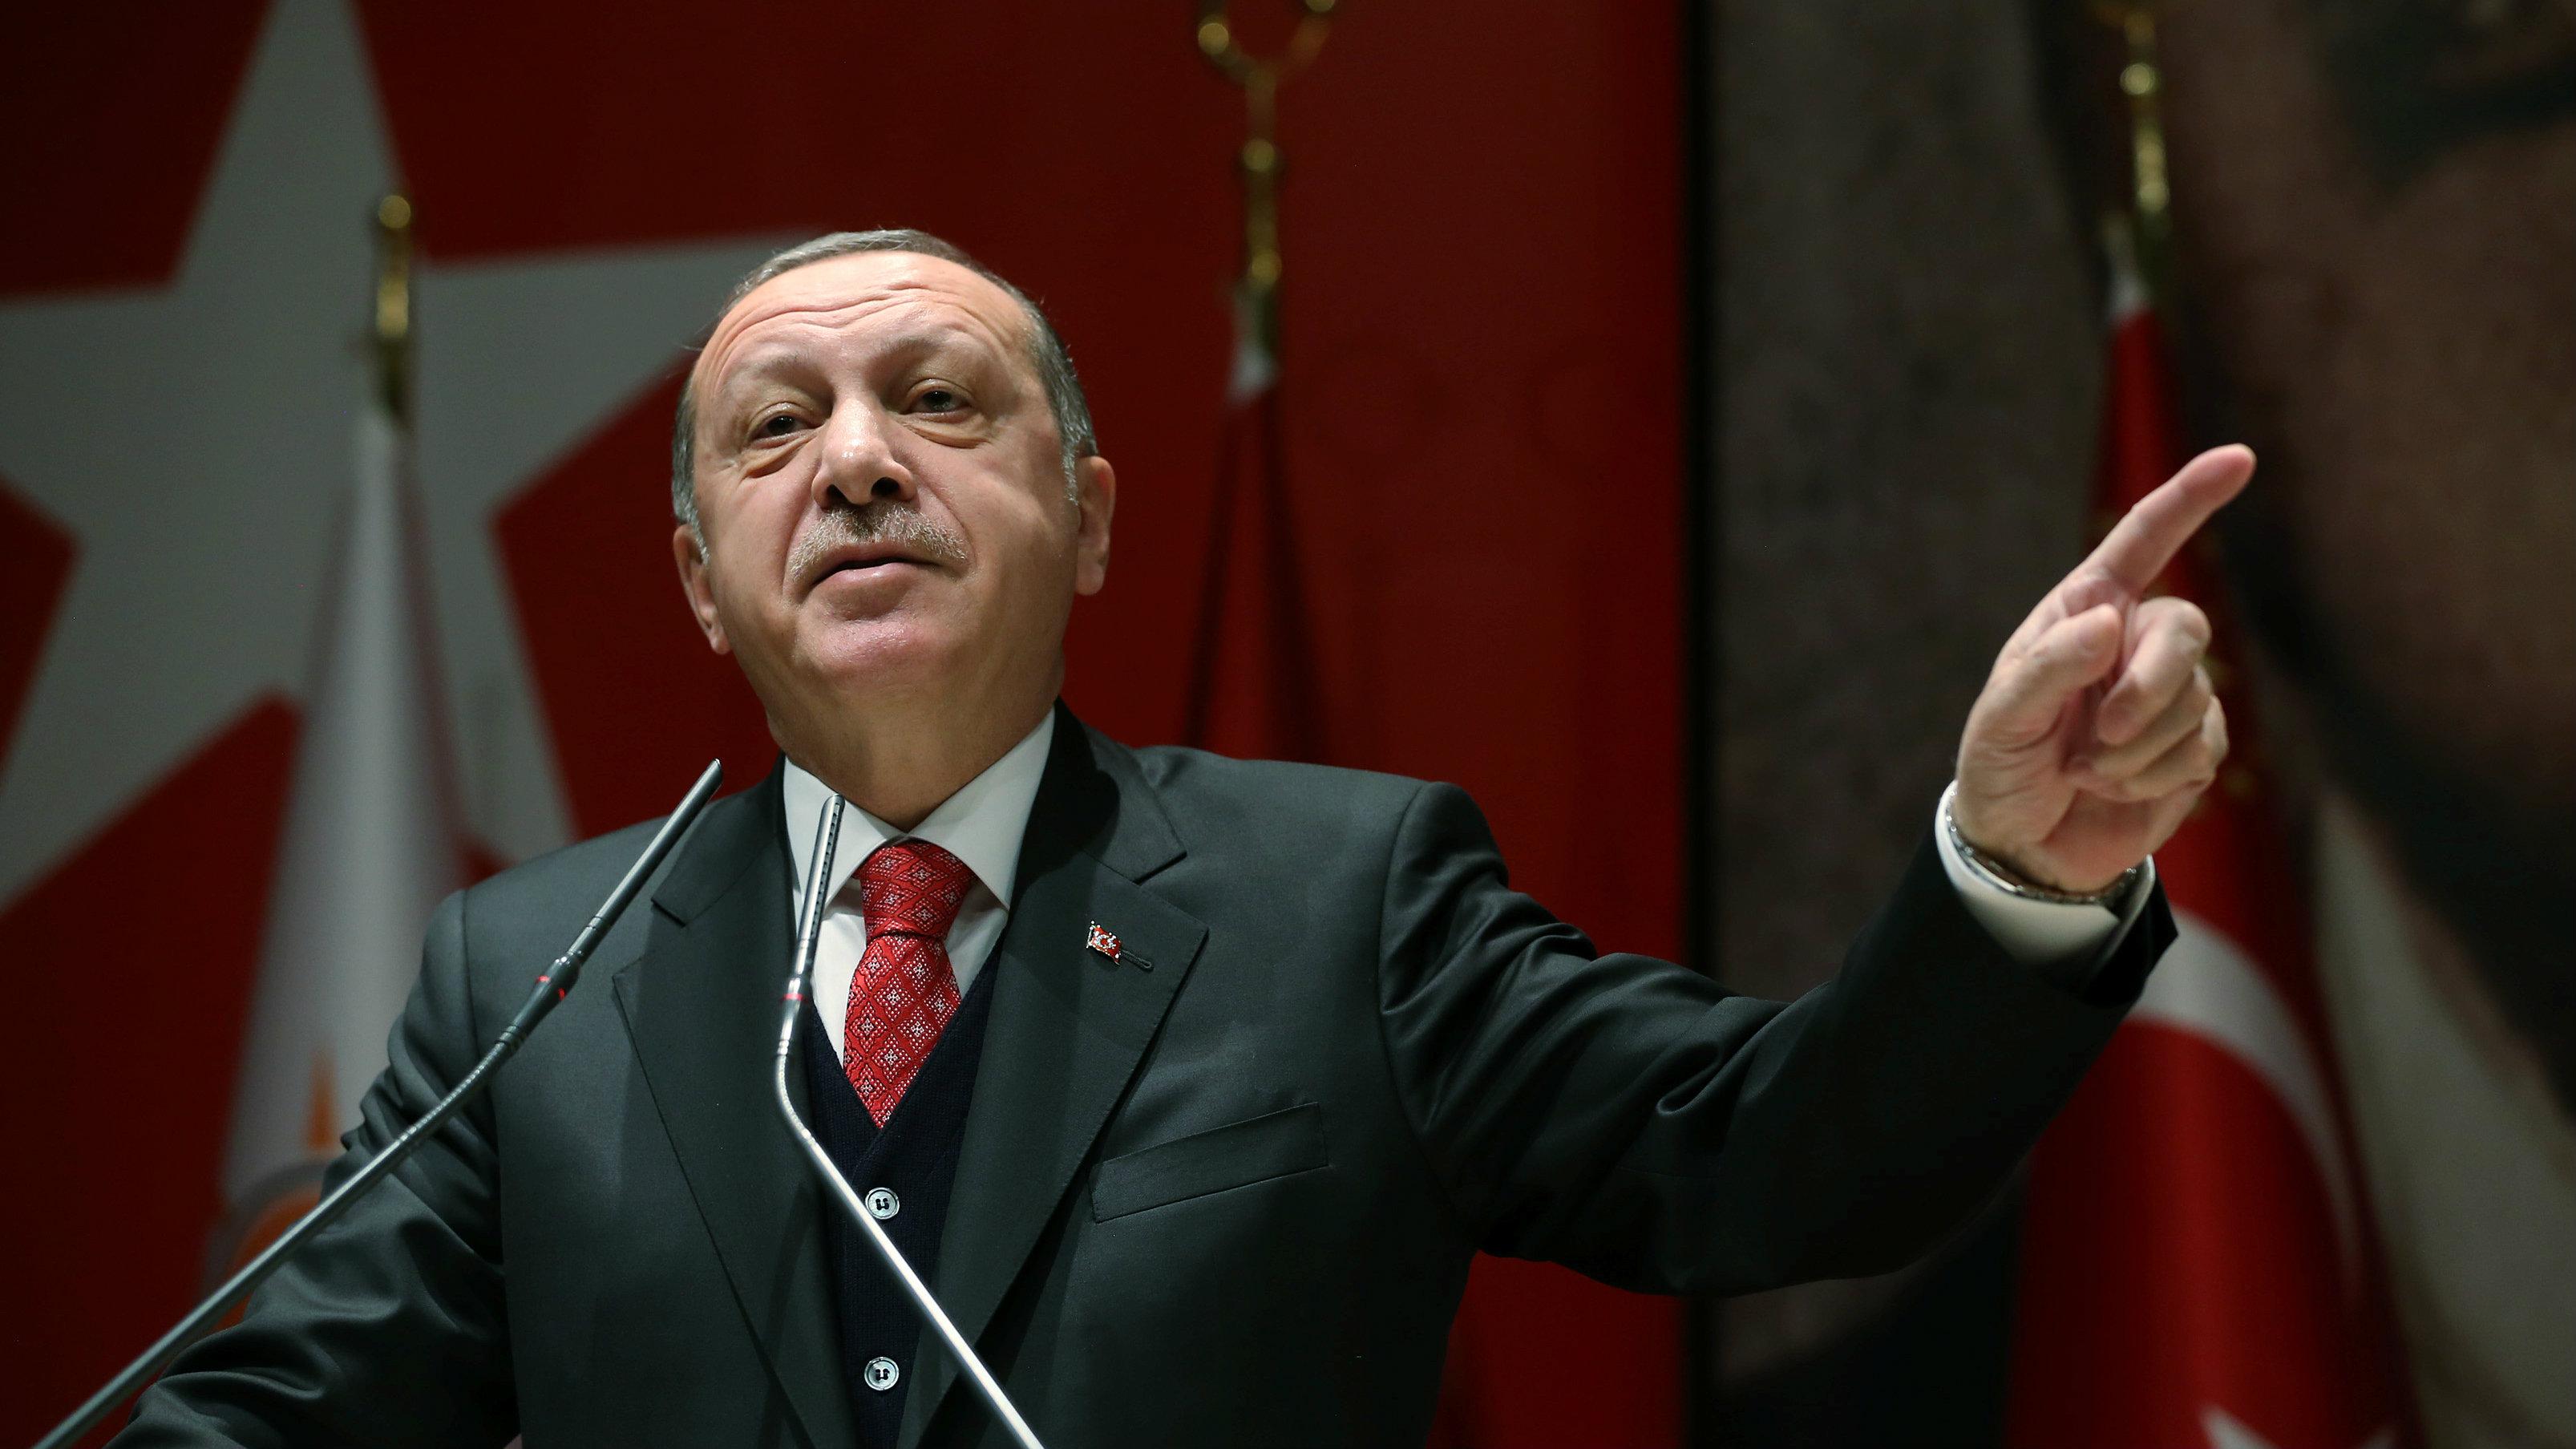 Turkey's President Tayyip Erdogan giving a speech